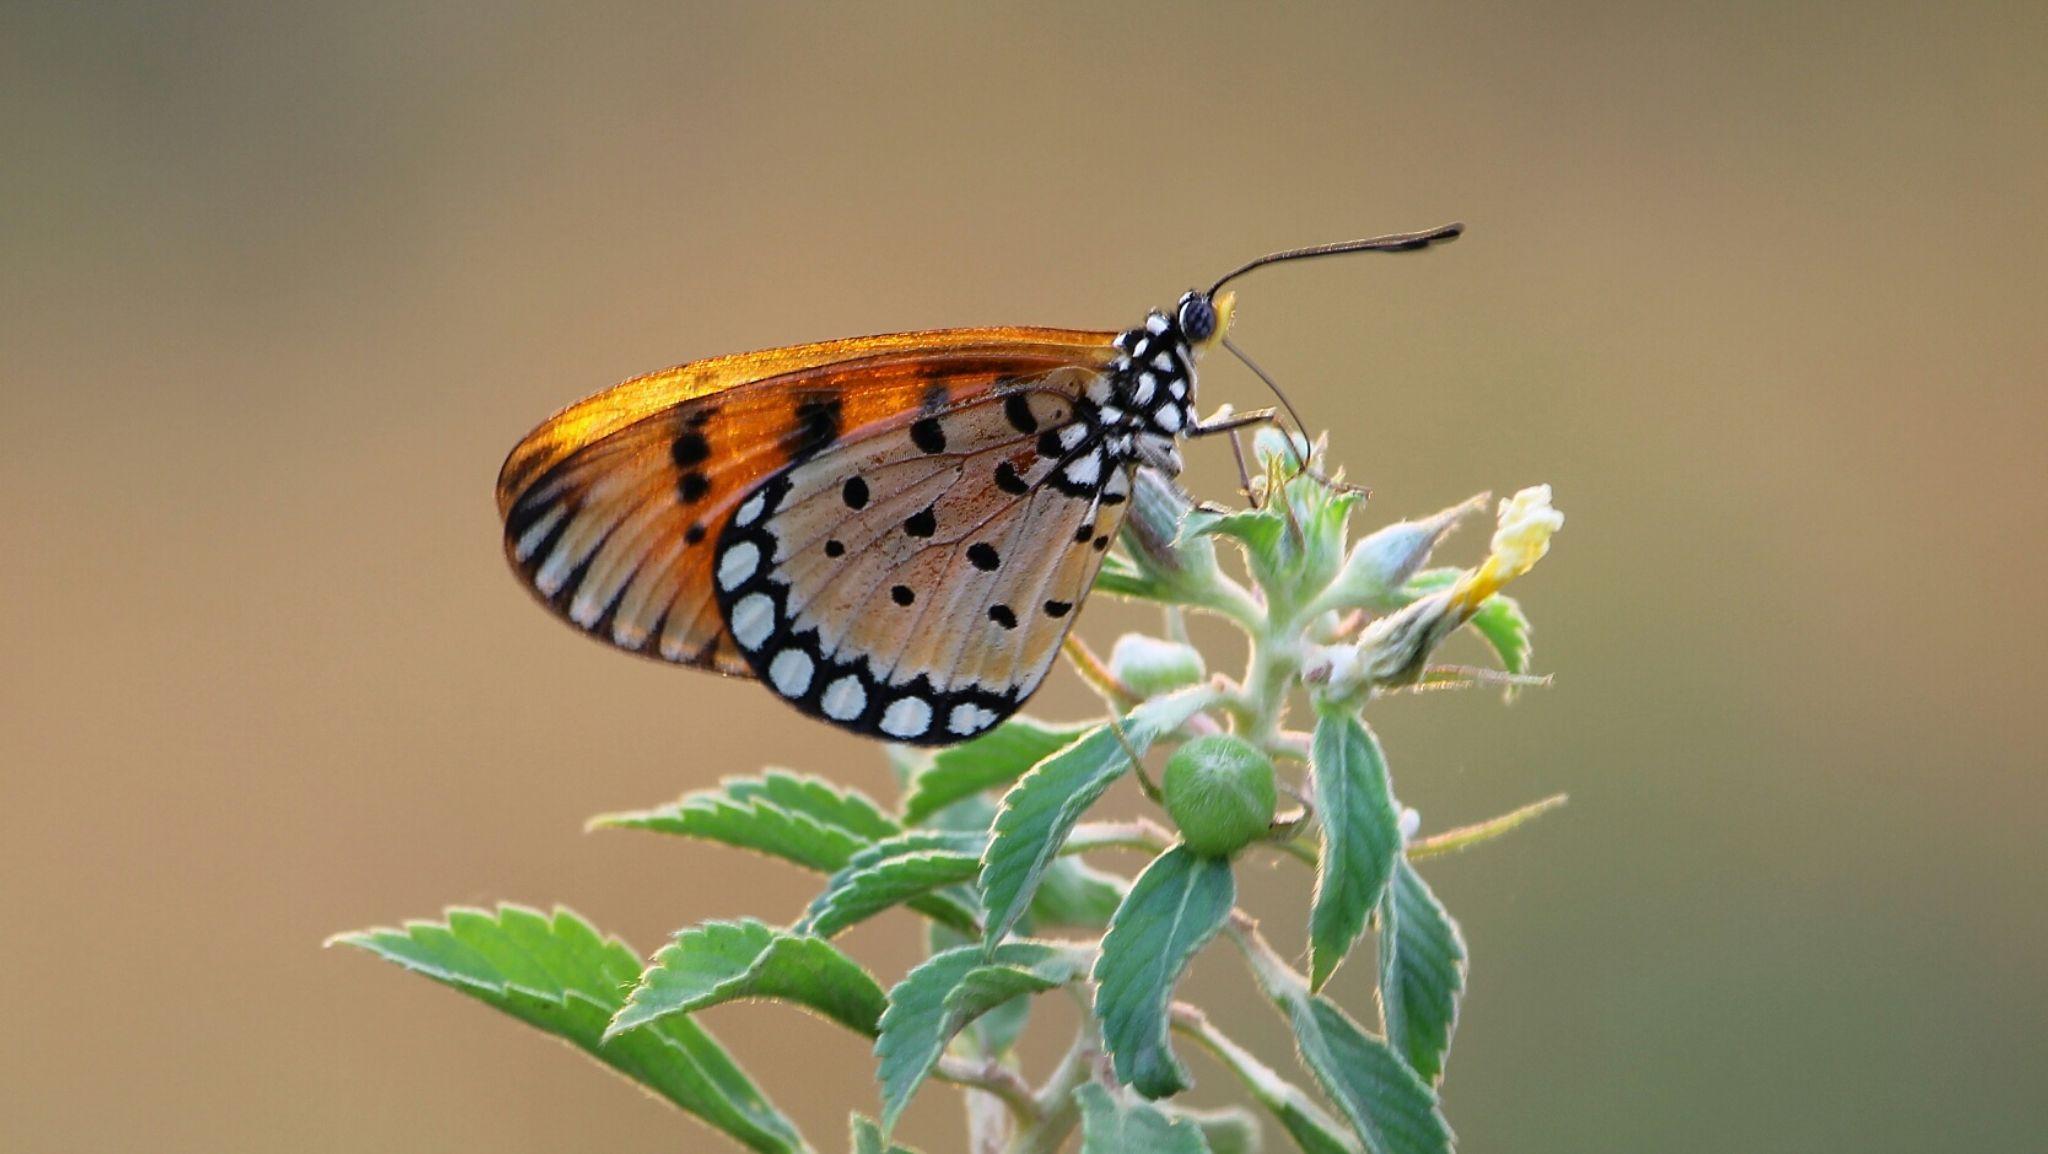 Butterfly orange by Saefull.Regina